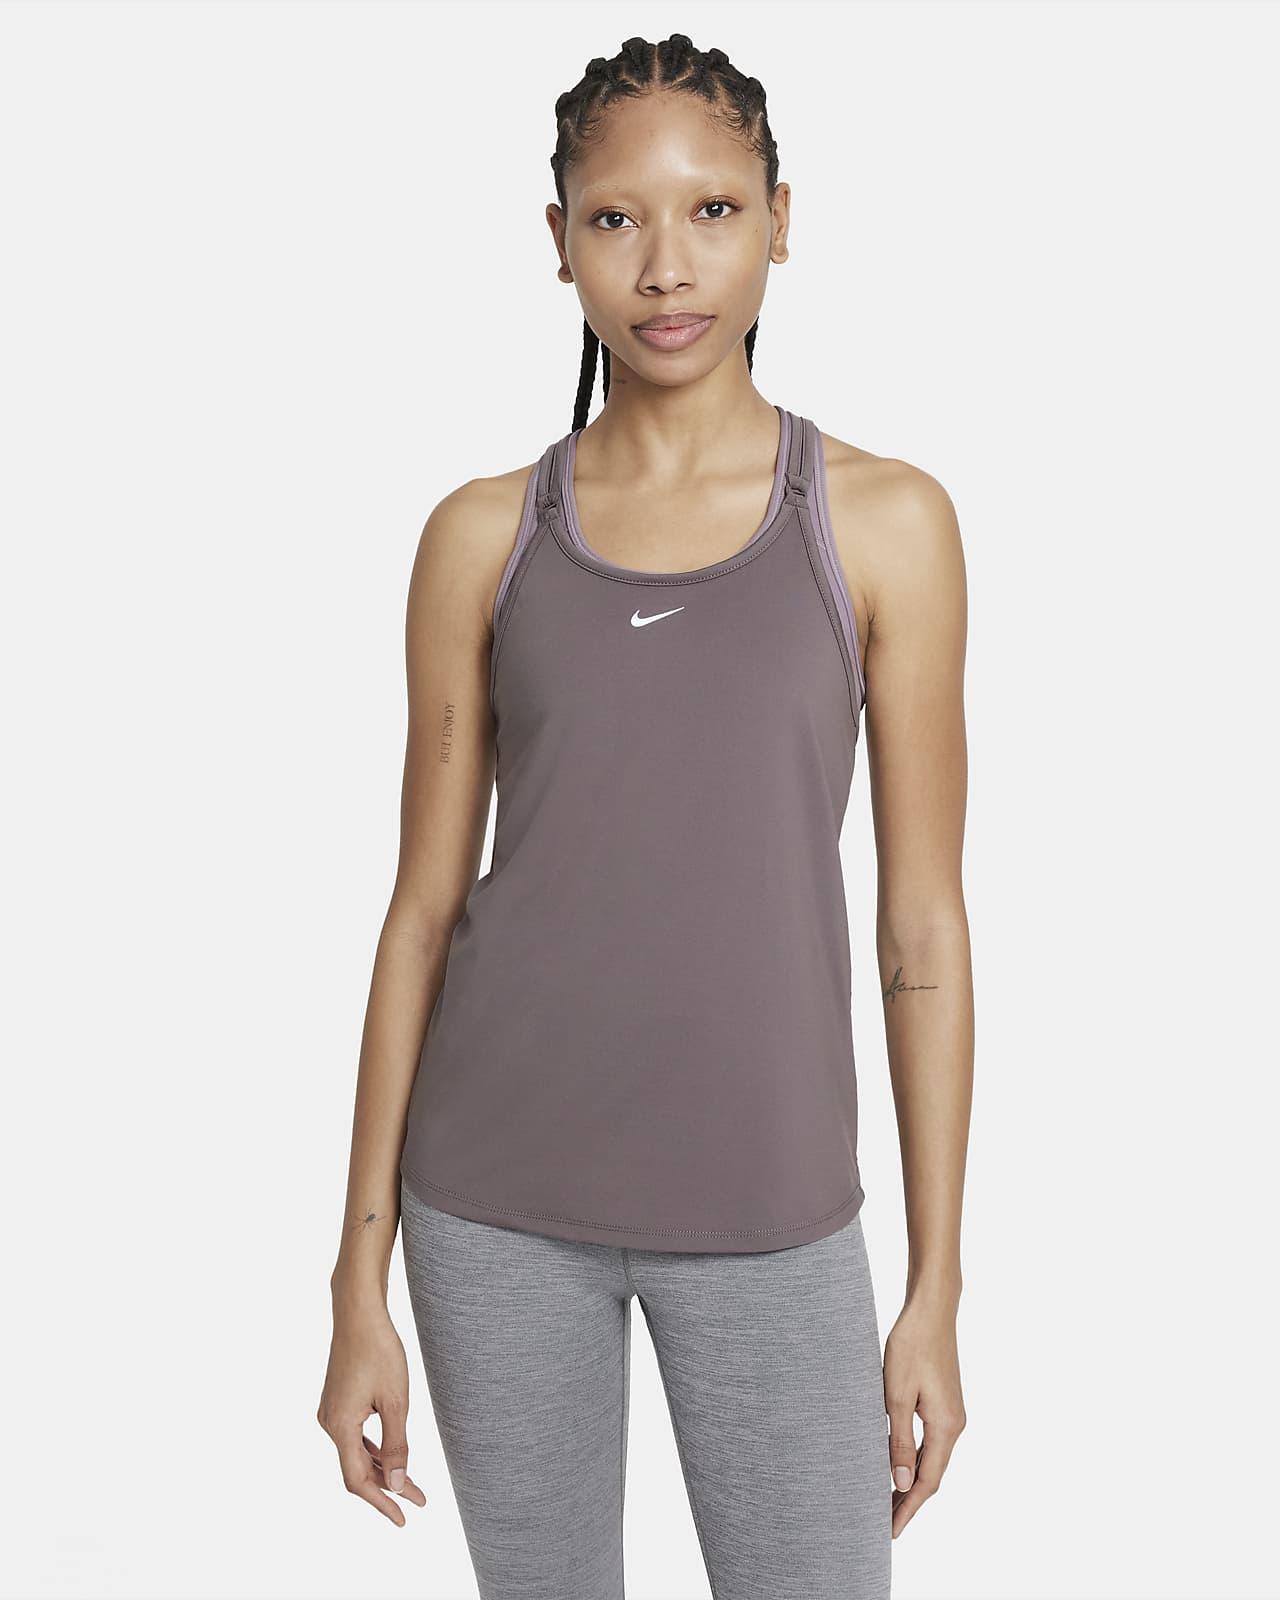 Camiseta de tirantes de ajuste slim para mujer Nike Dri-FIT One Luxe